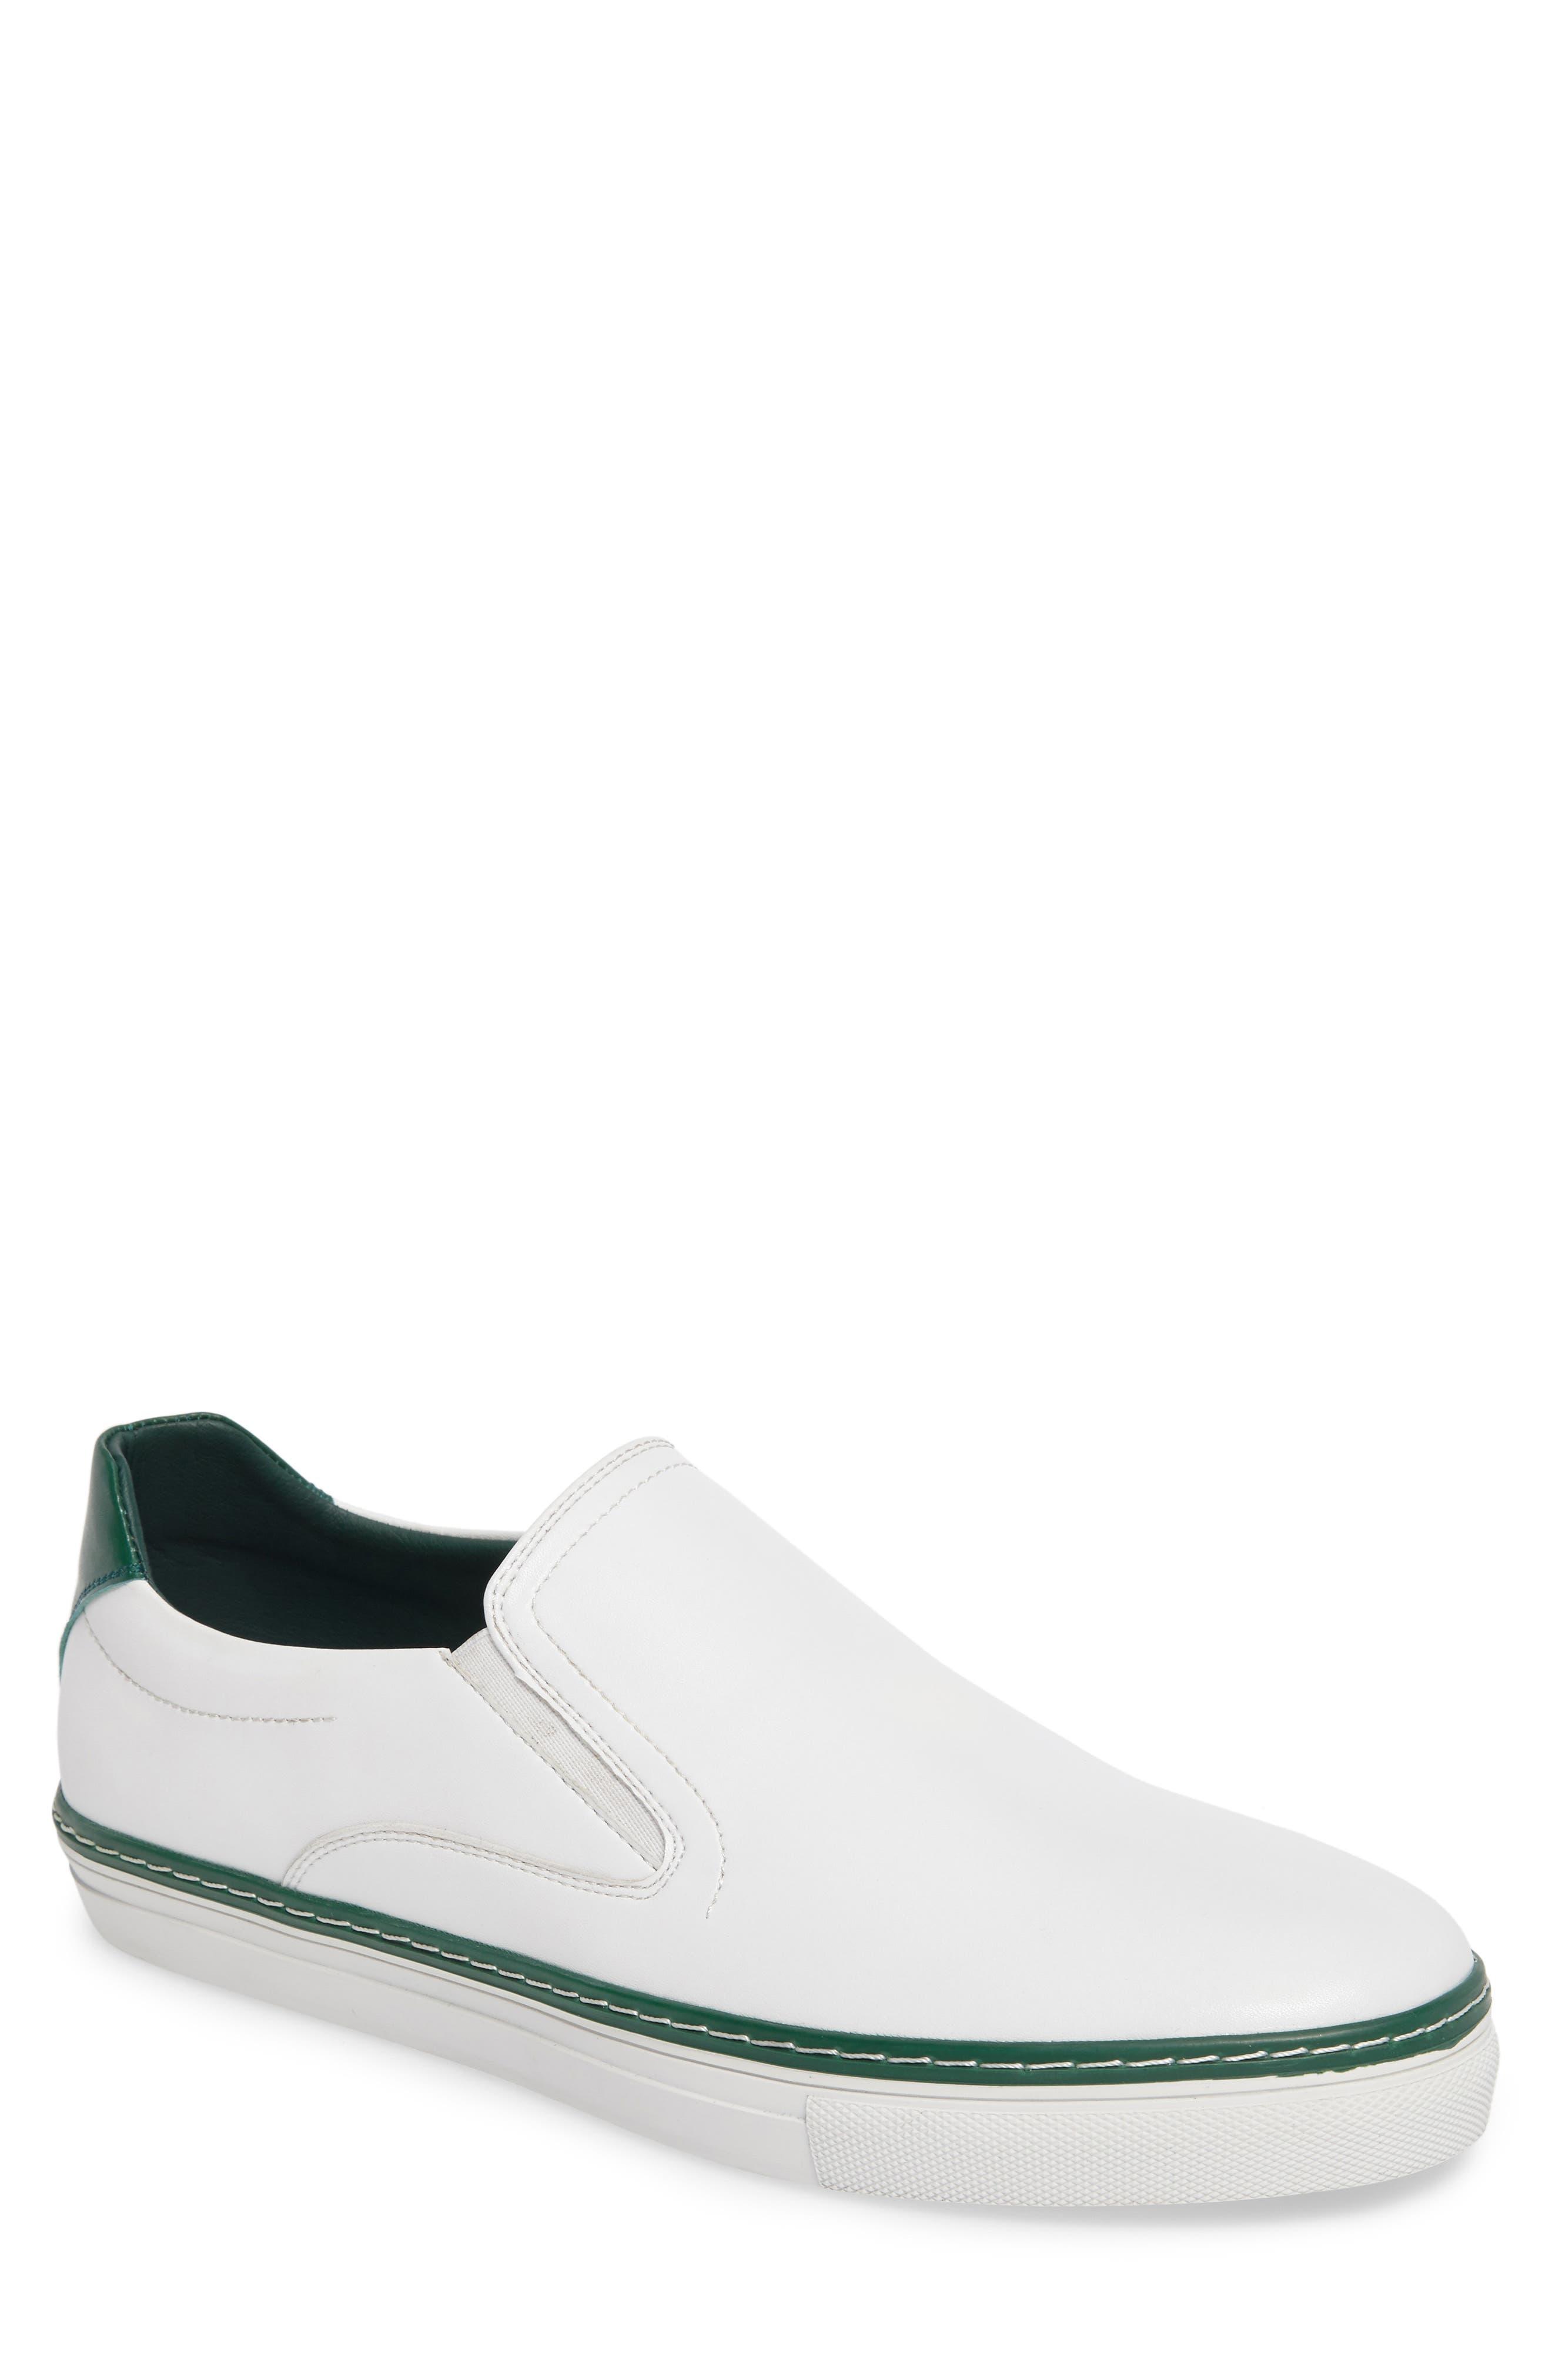 Dollis Slip-On,                         Main,                         color, White Leather